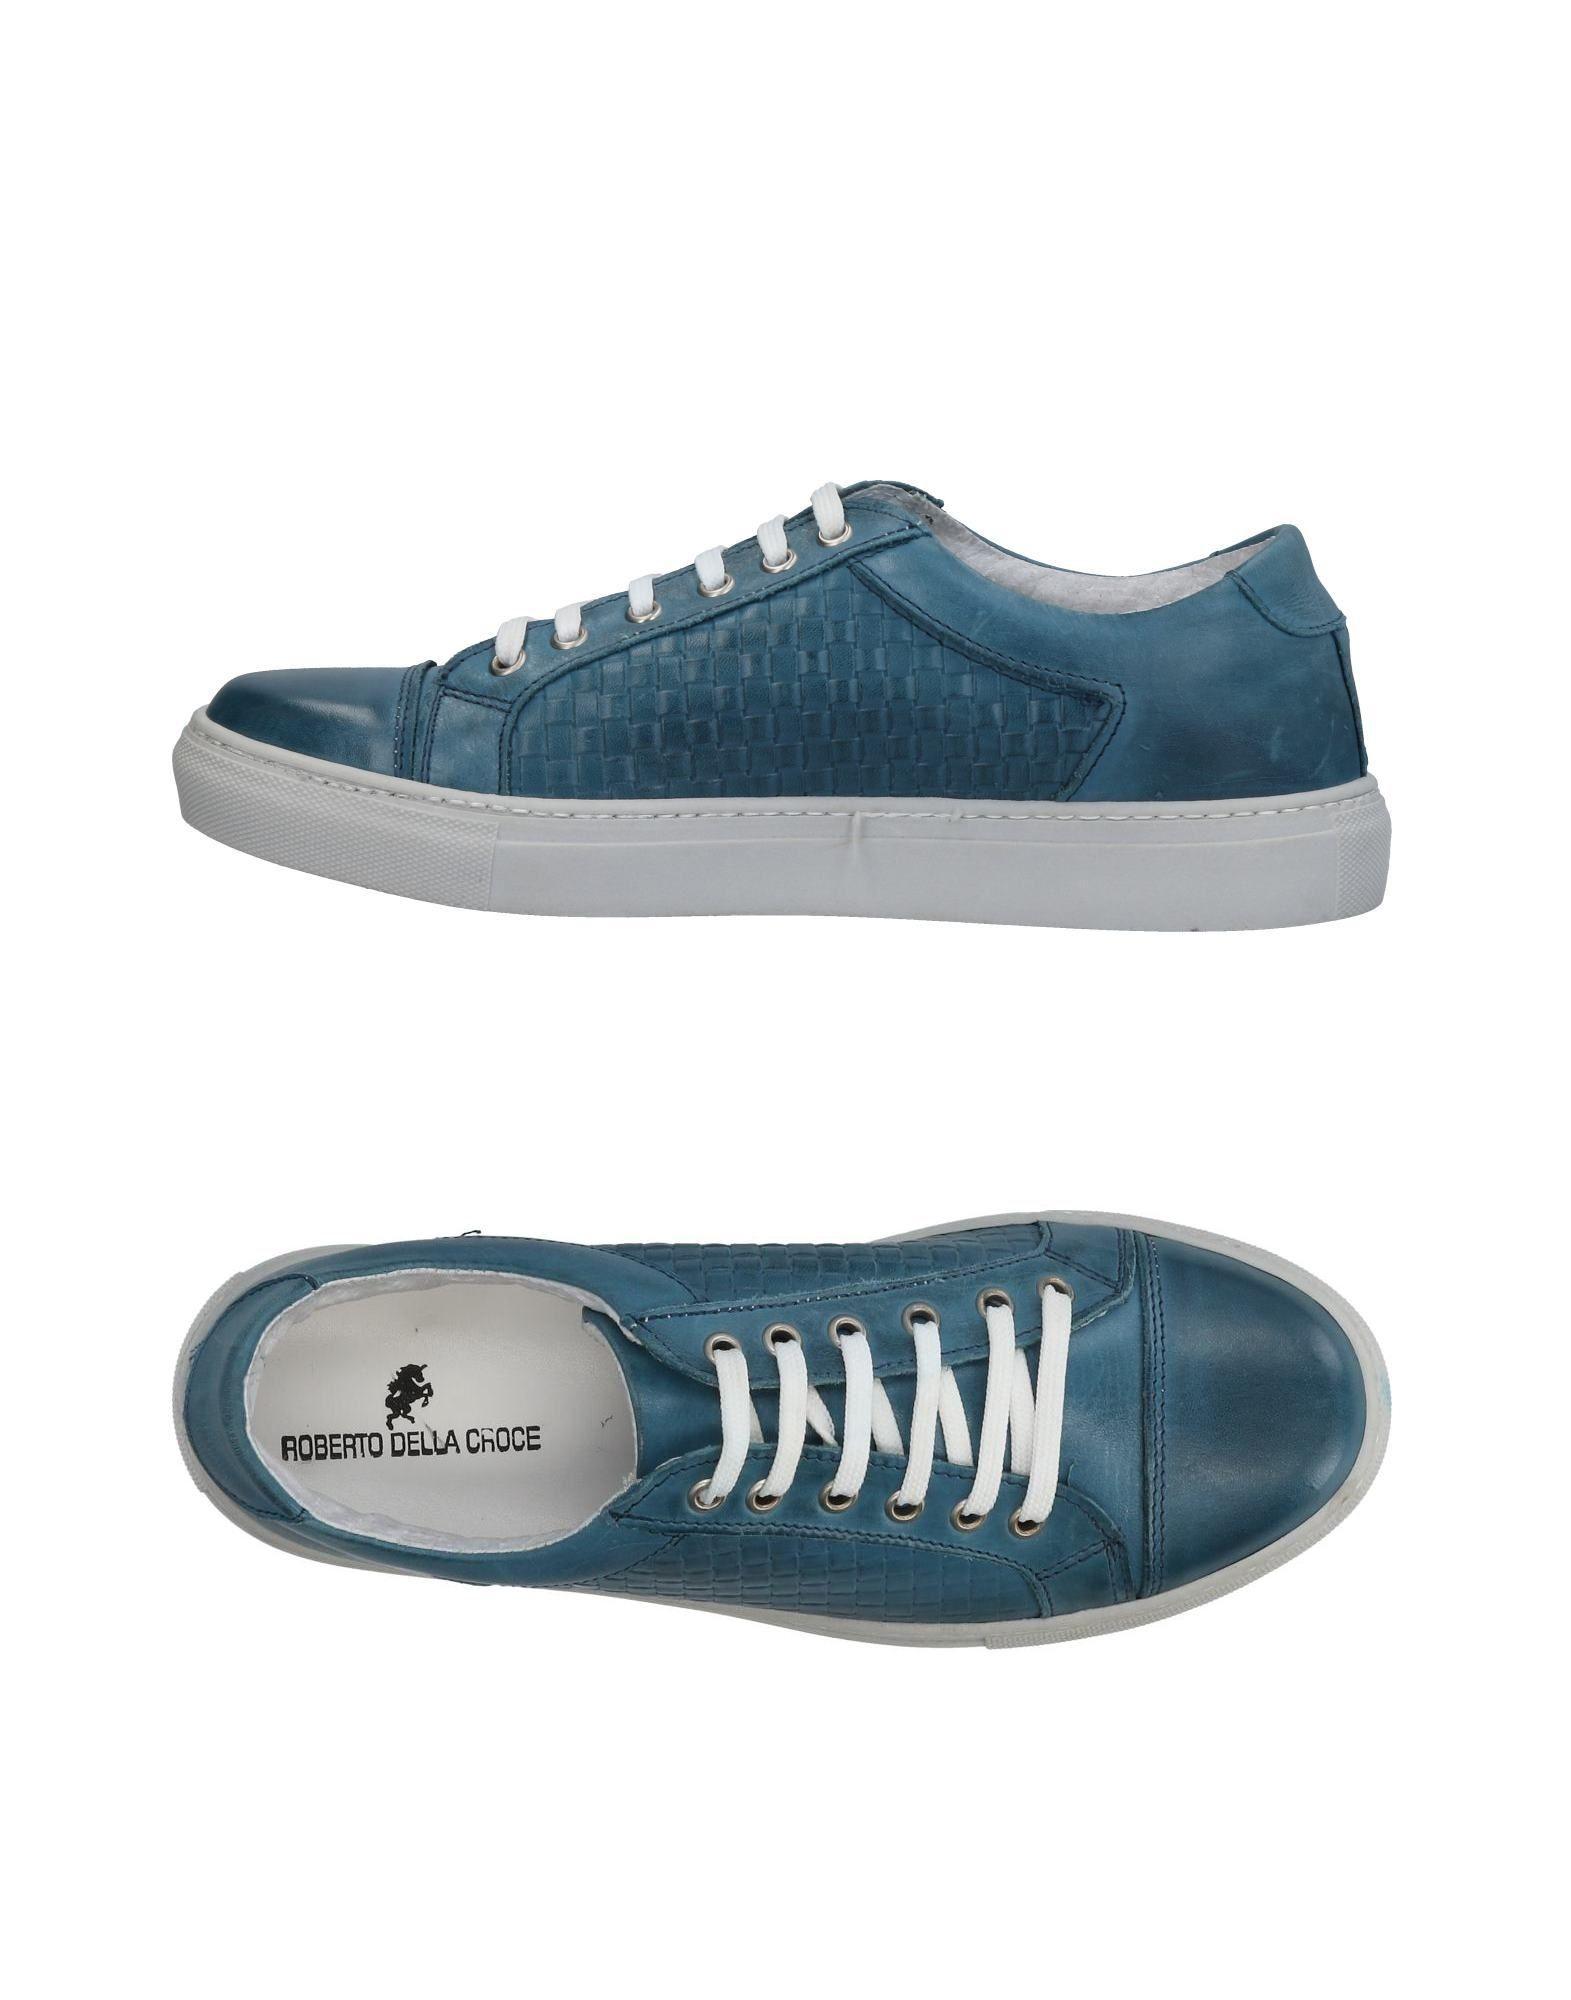 FOOTWEAR - Sandals Roberto Della Croce fUVPoIk0H2